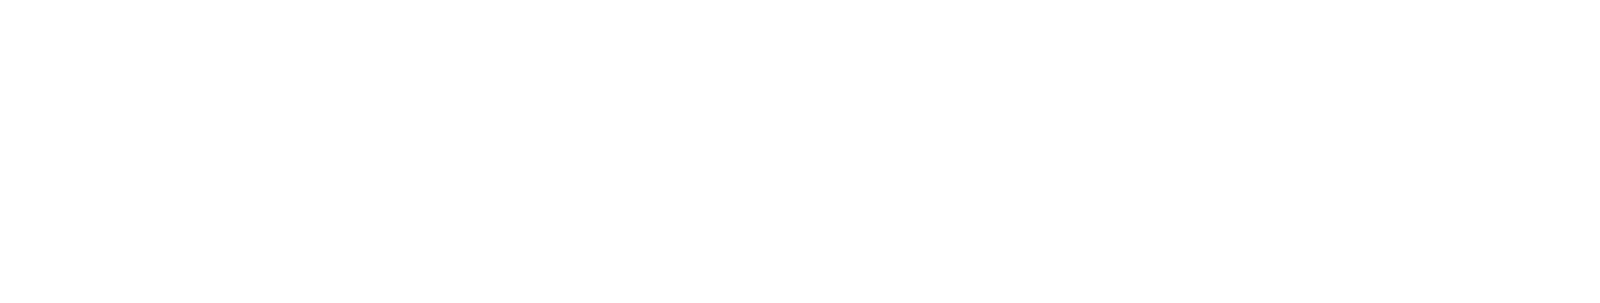 Adsup - Mobile Performance Agency